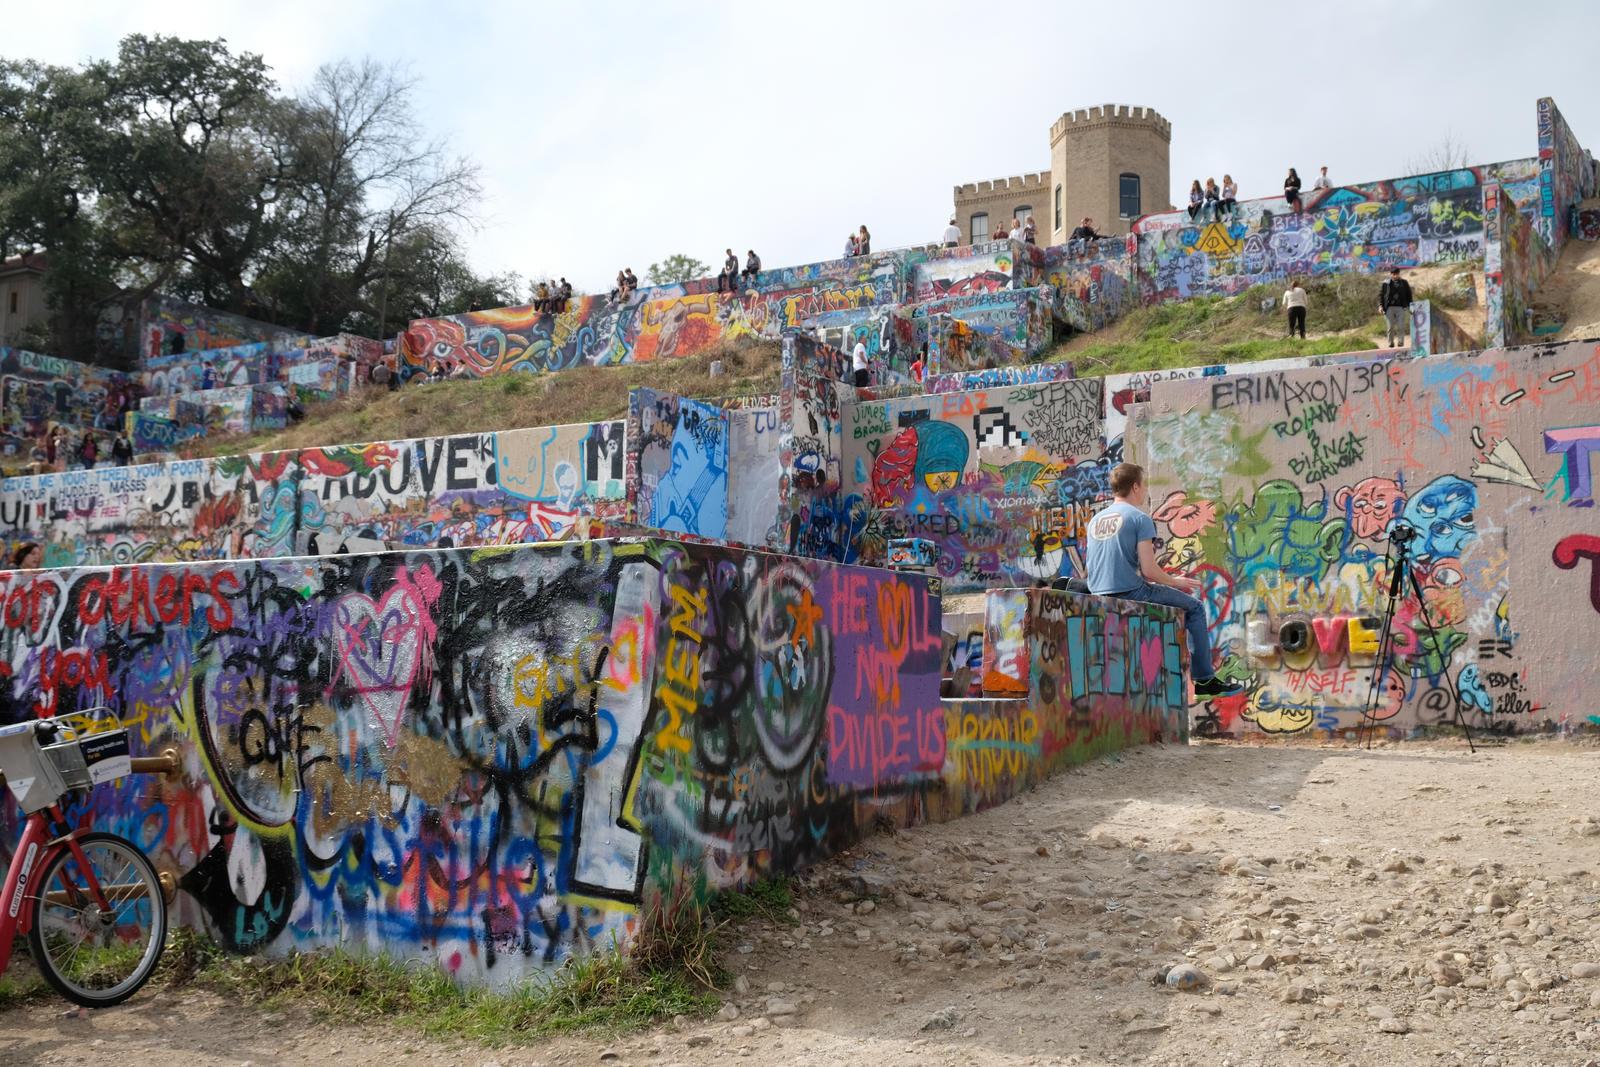 Castle Rock by the3dman